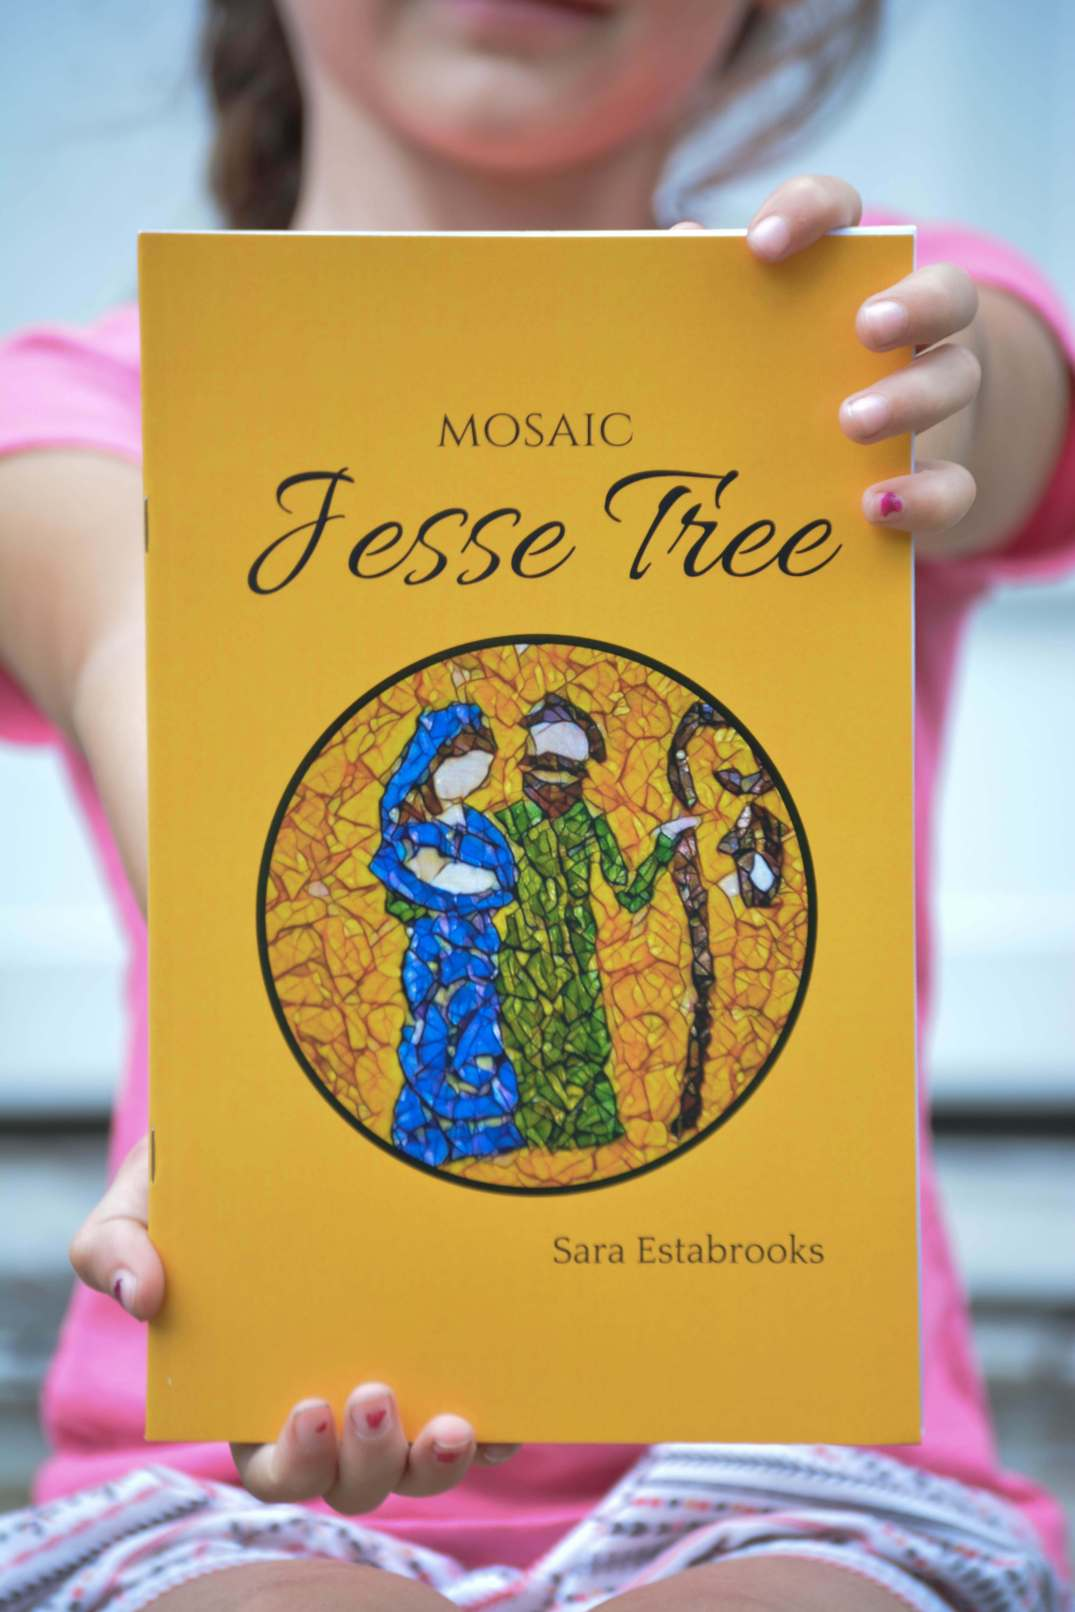 Mosaic Jesse Tree Imprimatur